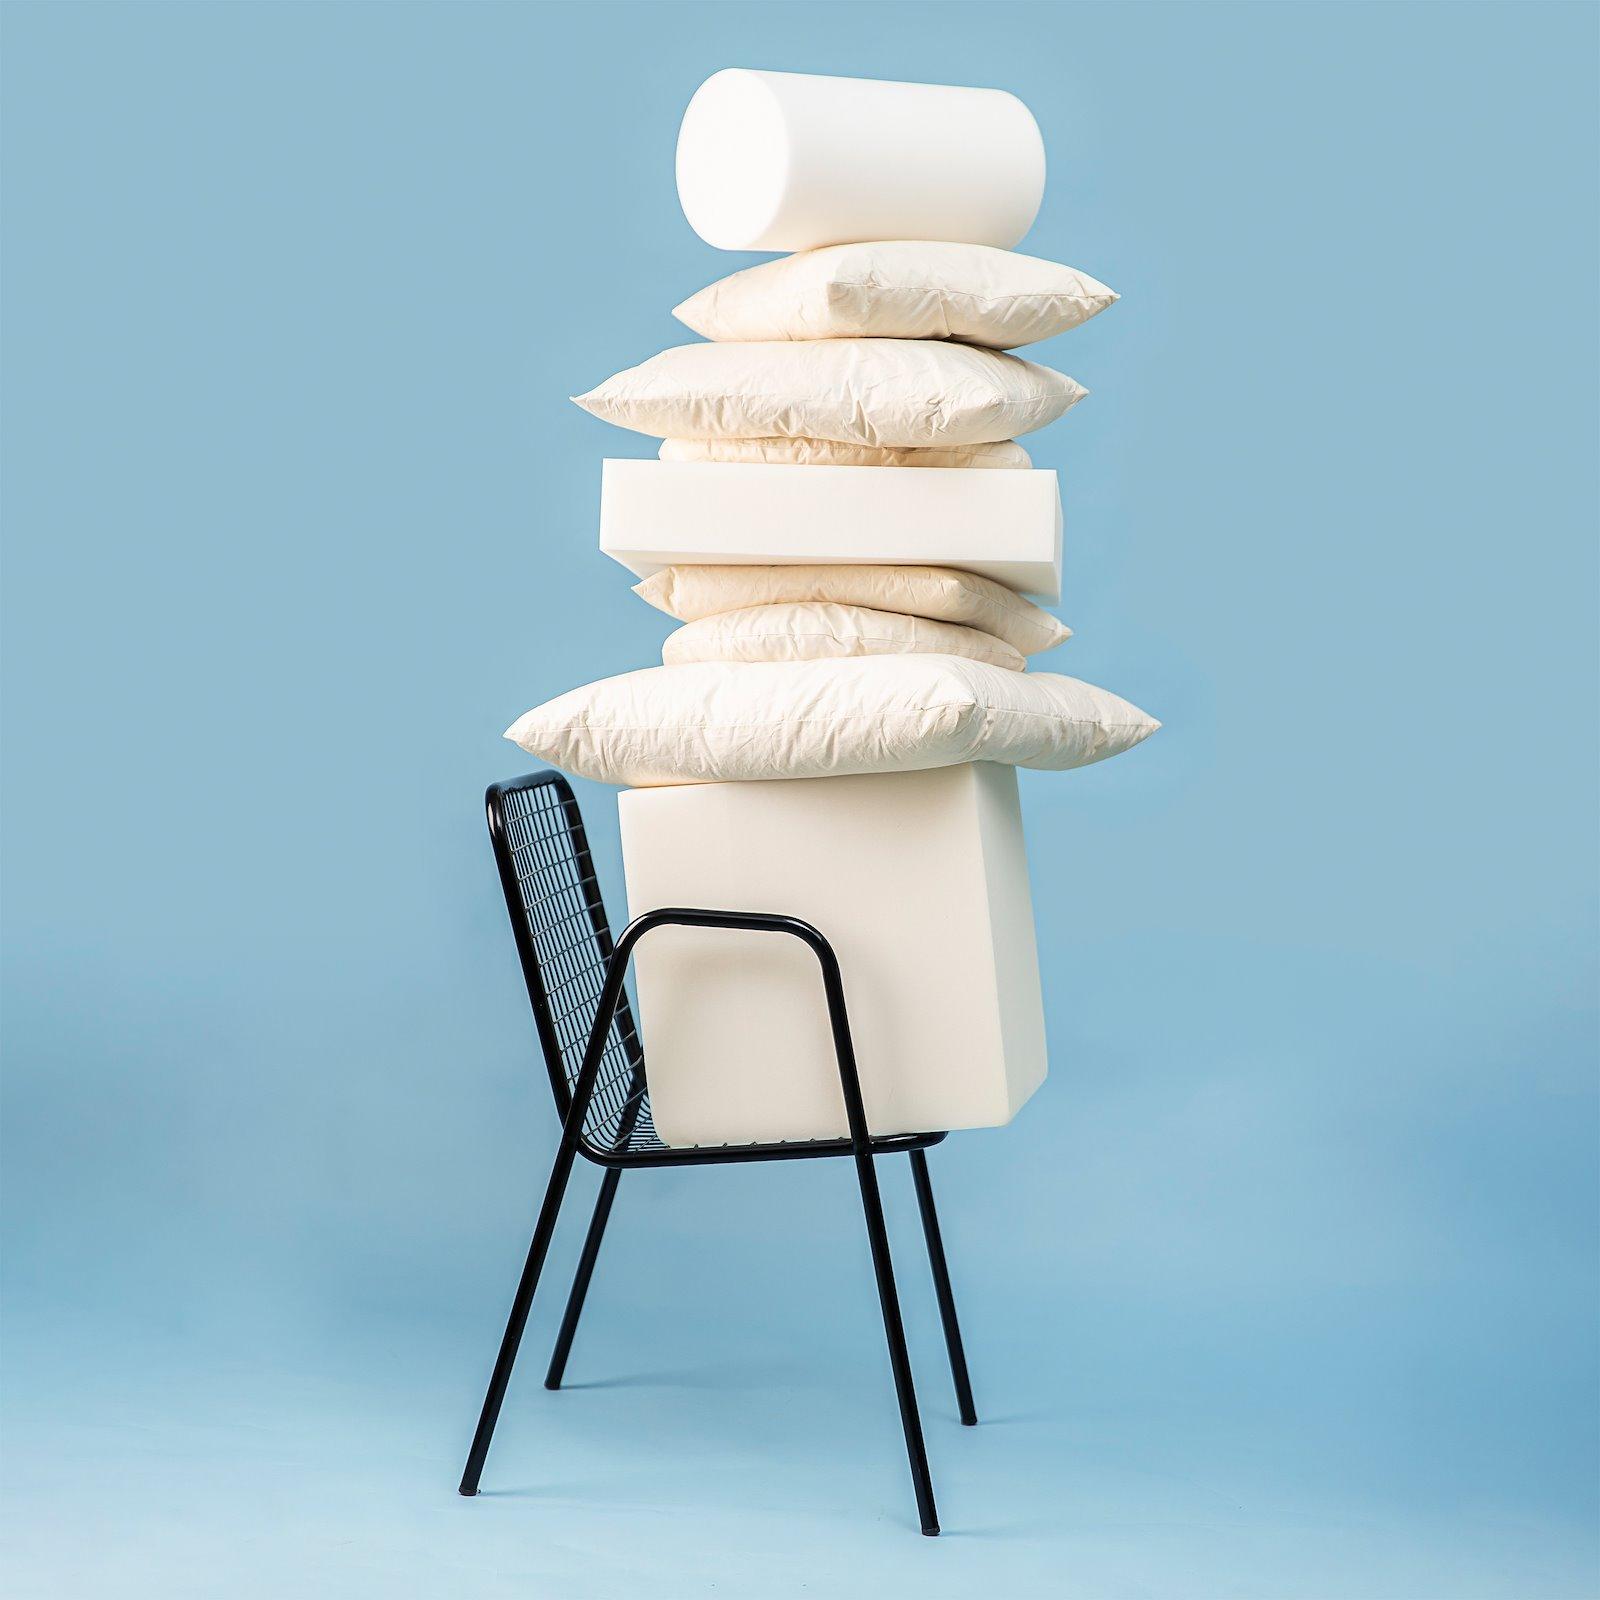 Cushion w/nature filling 60x60cm creme 38080061_38080002_38098050_38070048_38070045_38070061_38070050_38070060_bundle